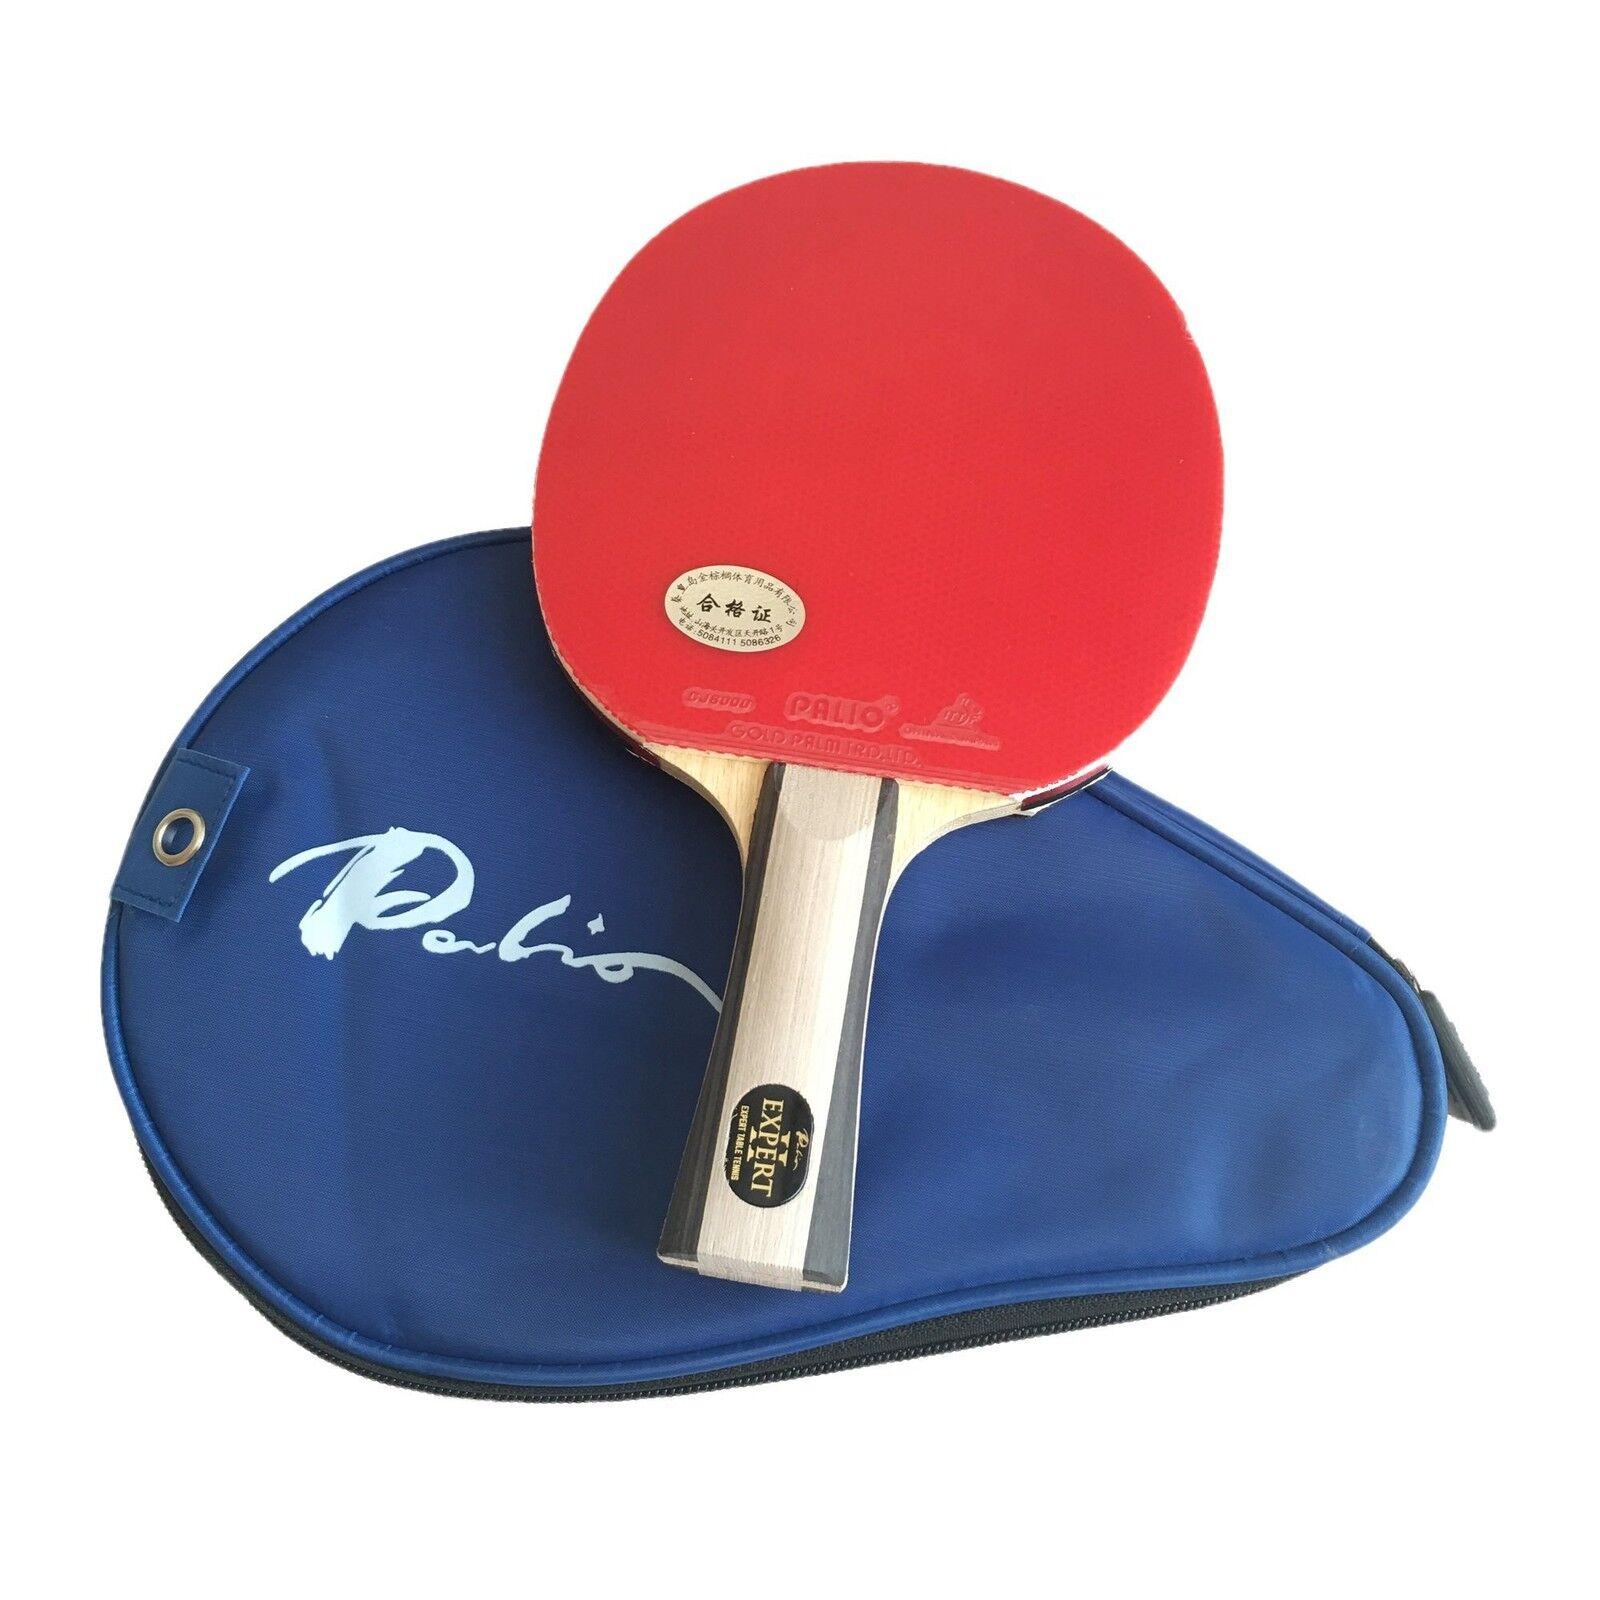 Palio Expert 2 Table Tennis Bat & Case